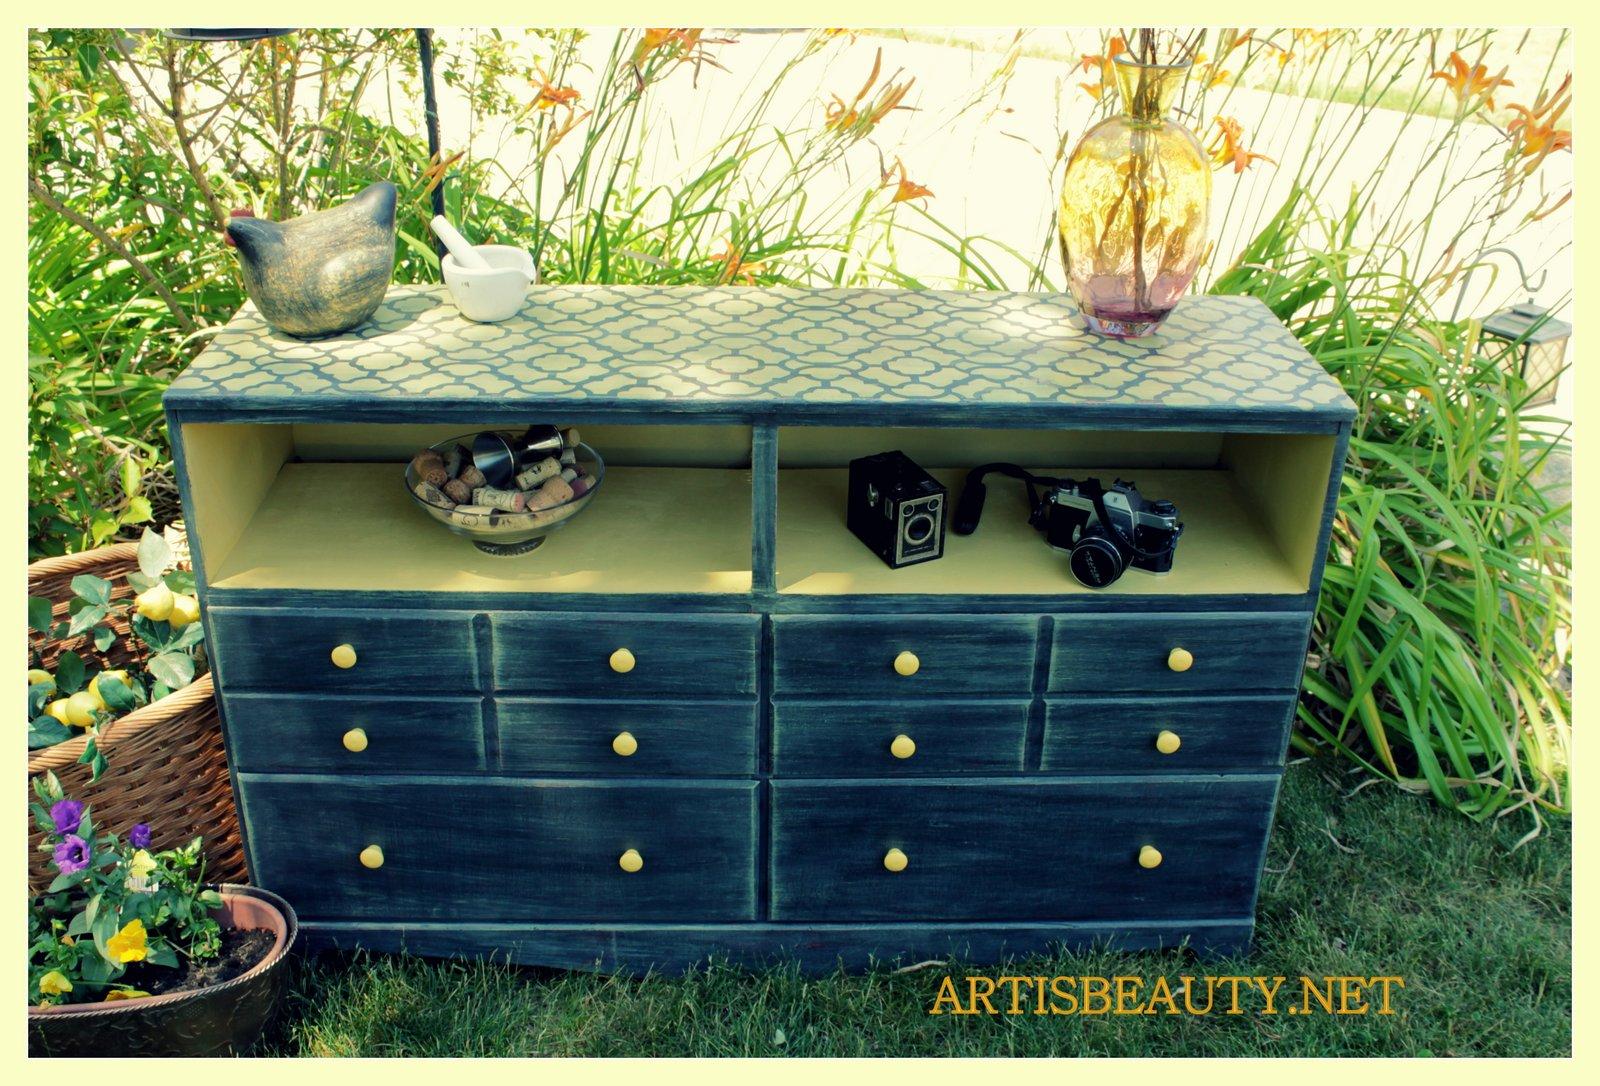 ART IS BEAUTY Trashy dresser turned Entertainment Center